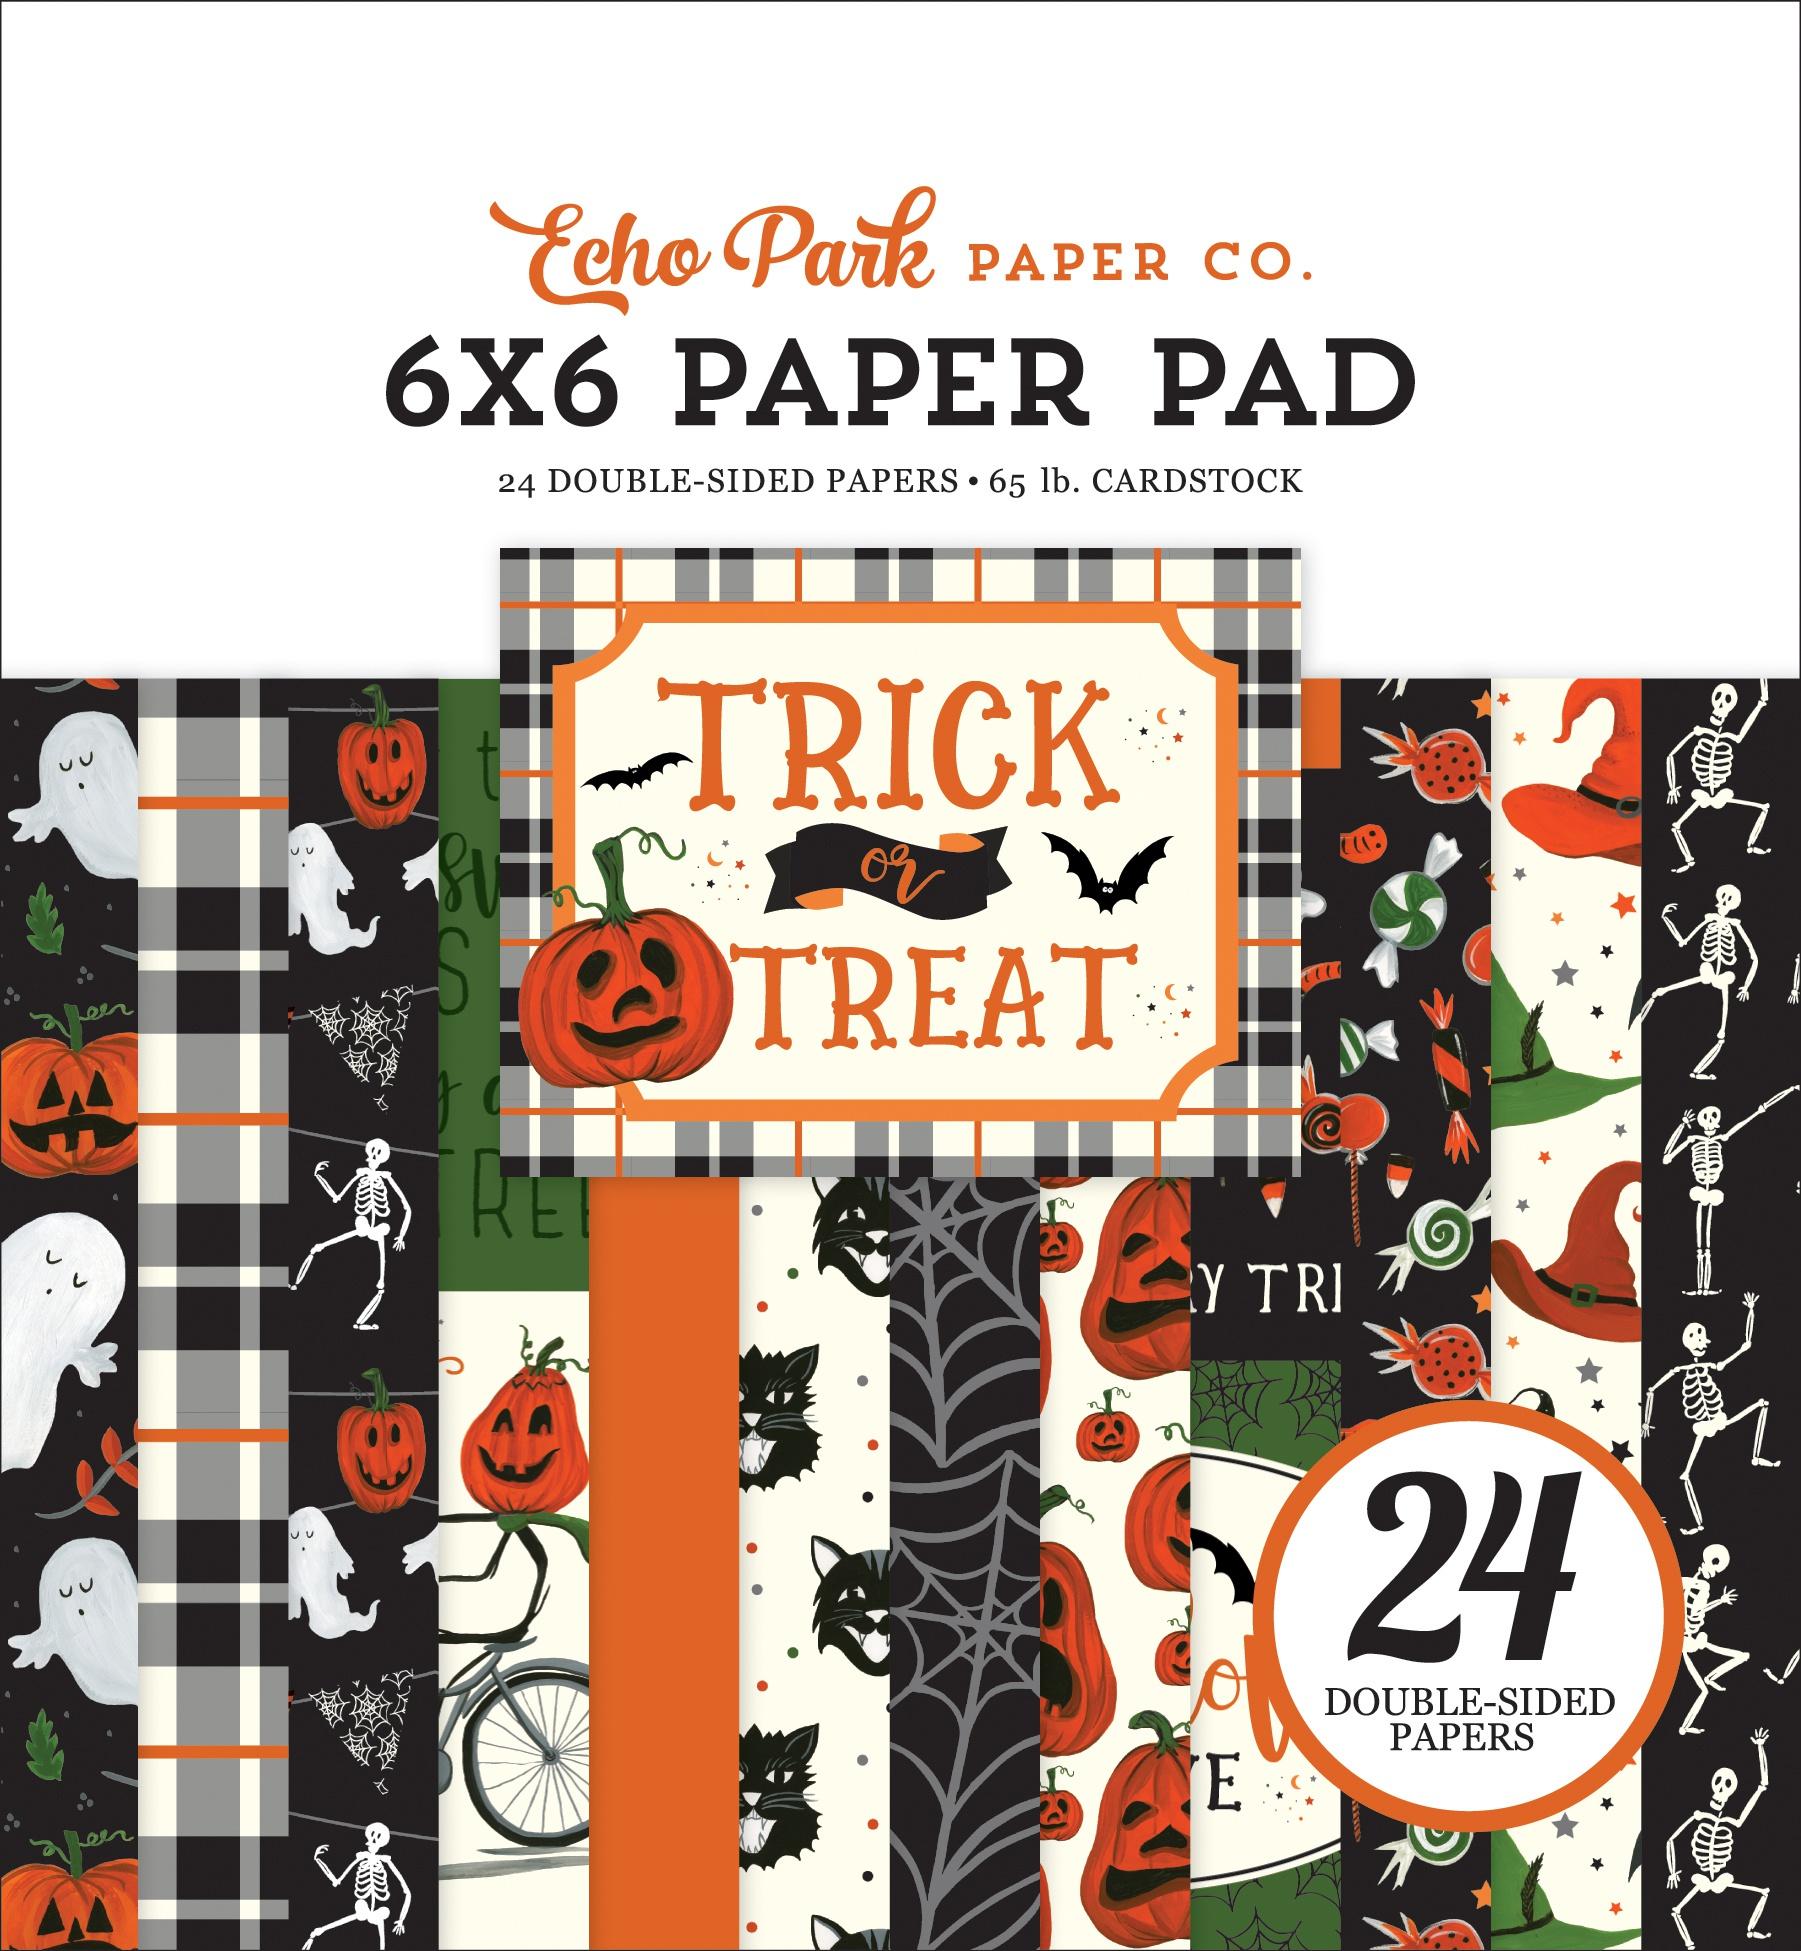 Echo Park Double-Sided Paper Pad 6X6 24/Pkg-Trick Or Treat, 12 Designs/2 Each